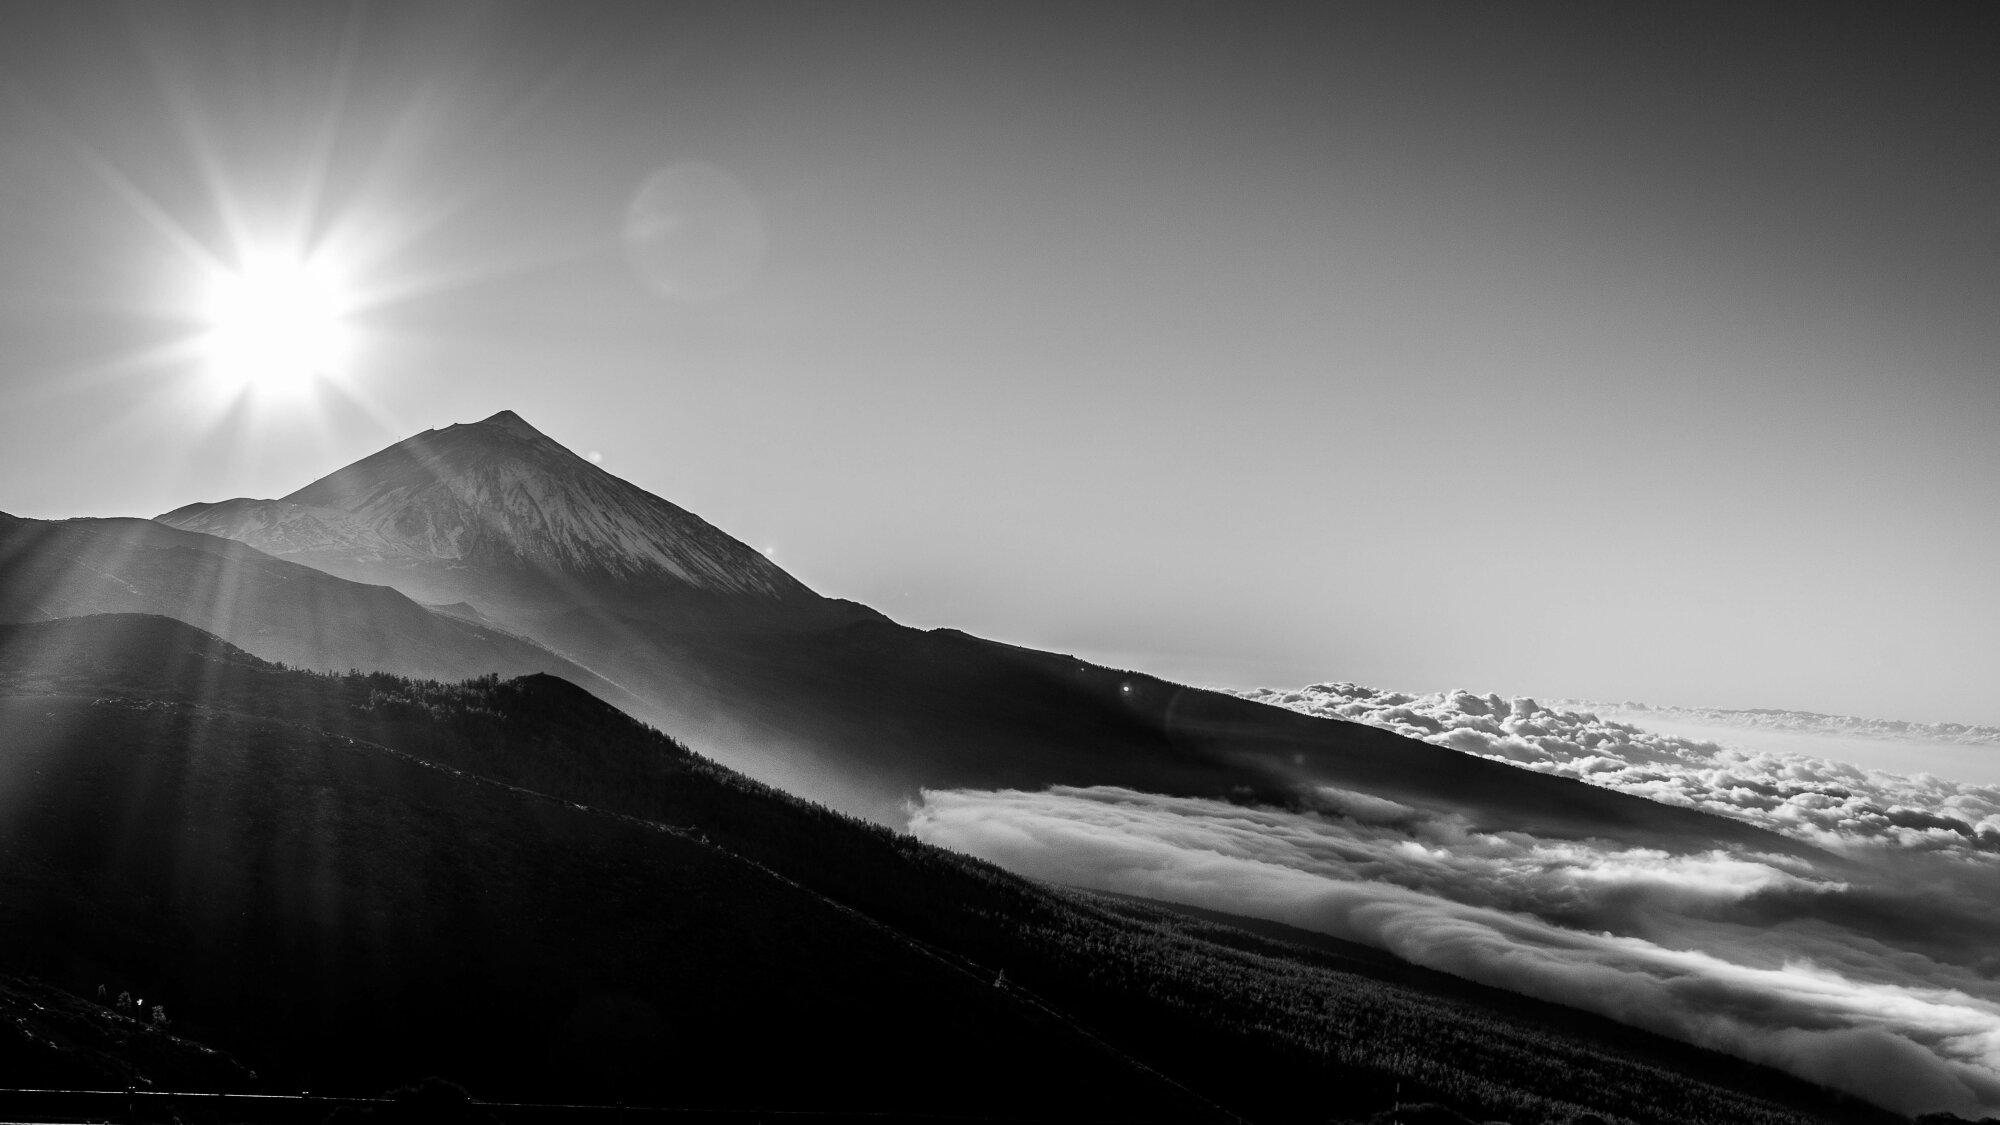 Ténérife - Parc national du Teide